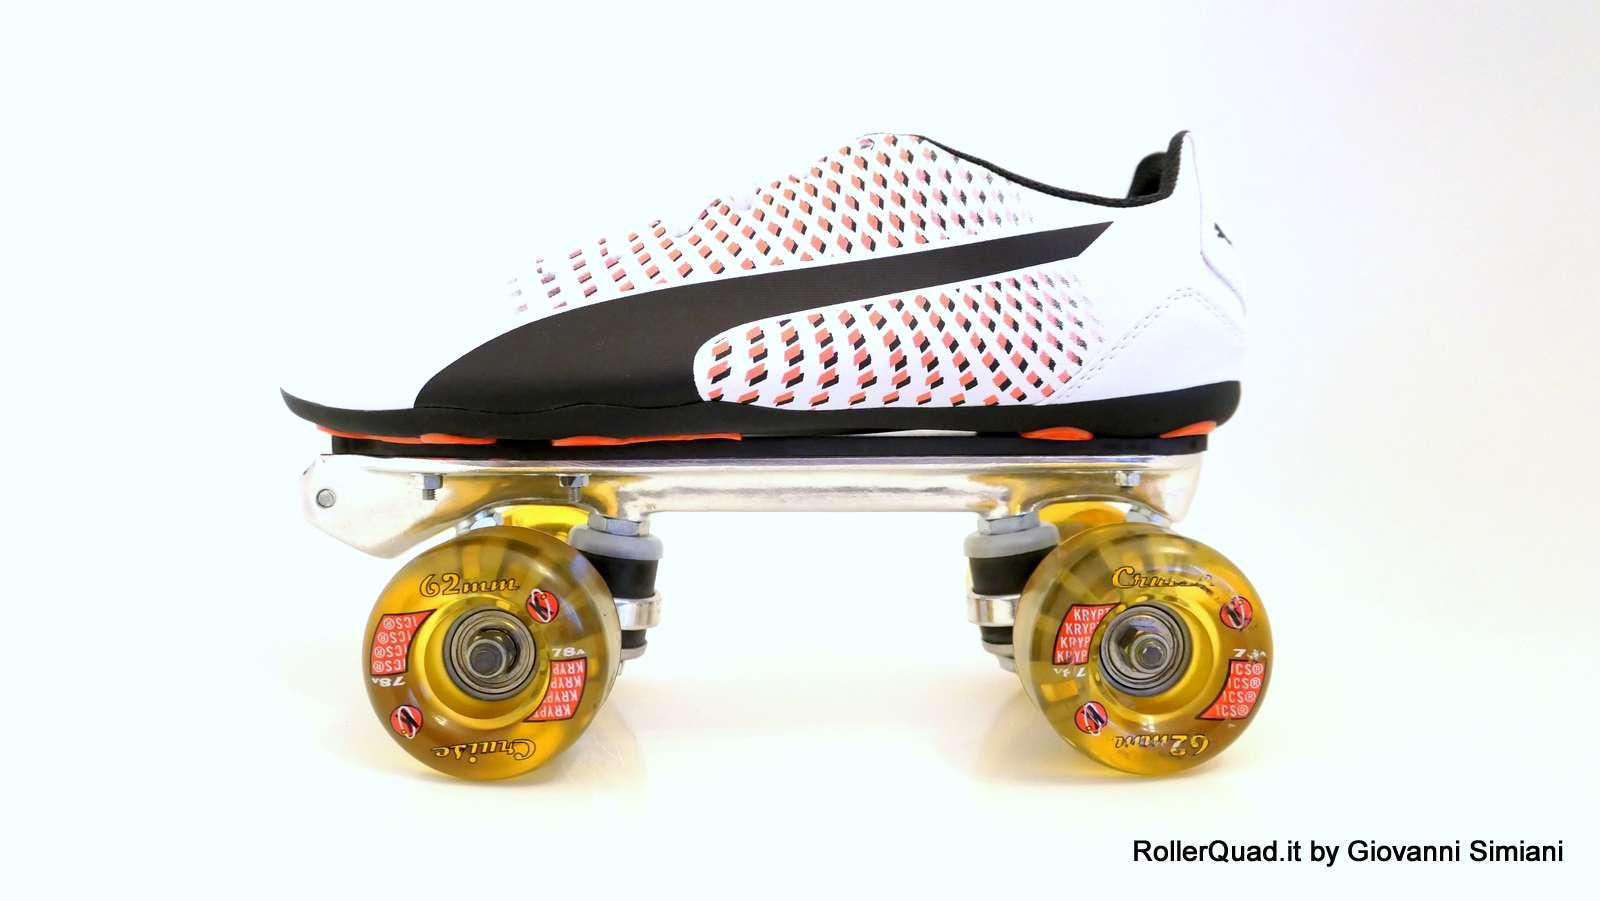 01-rollerquad_it_Giovanni_Simiani